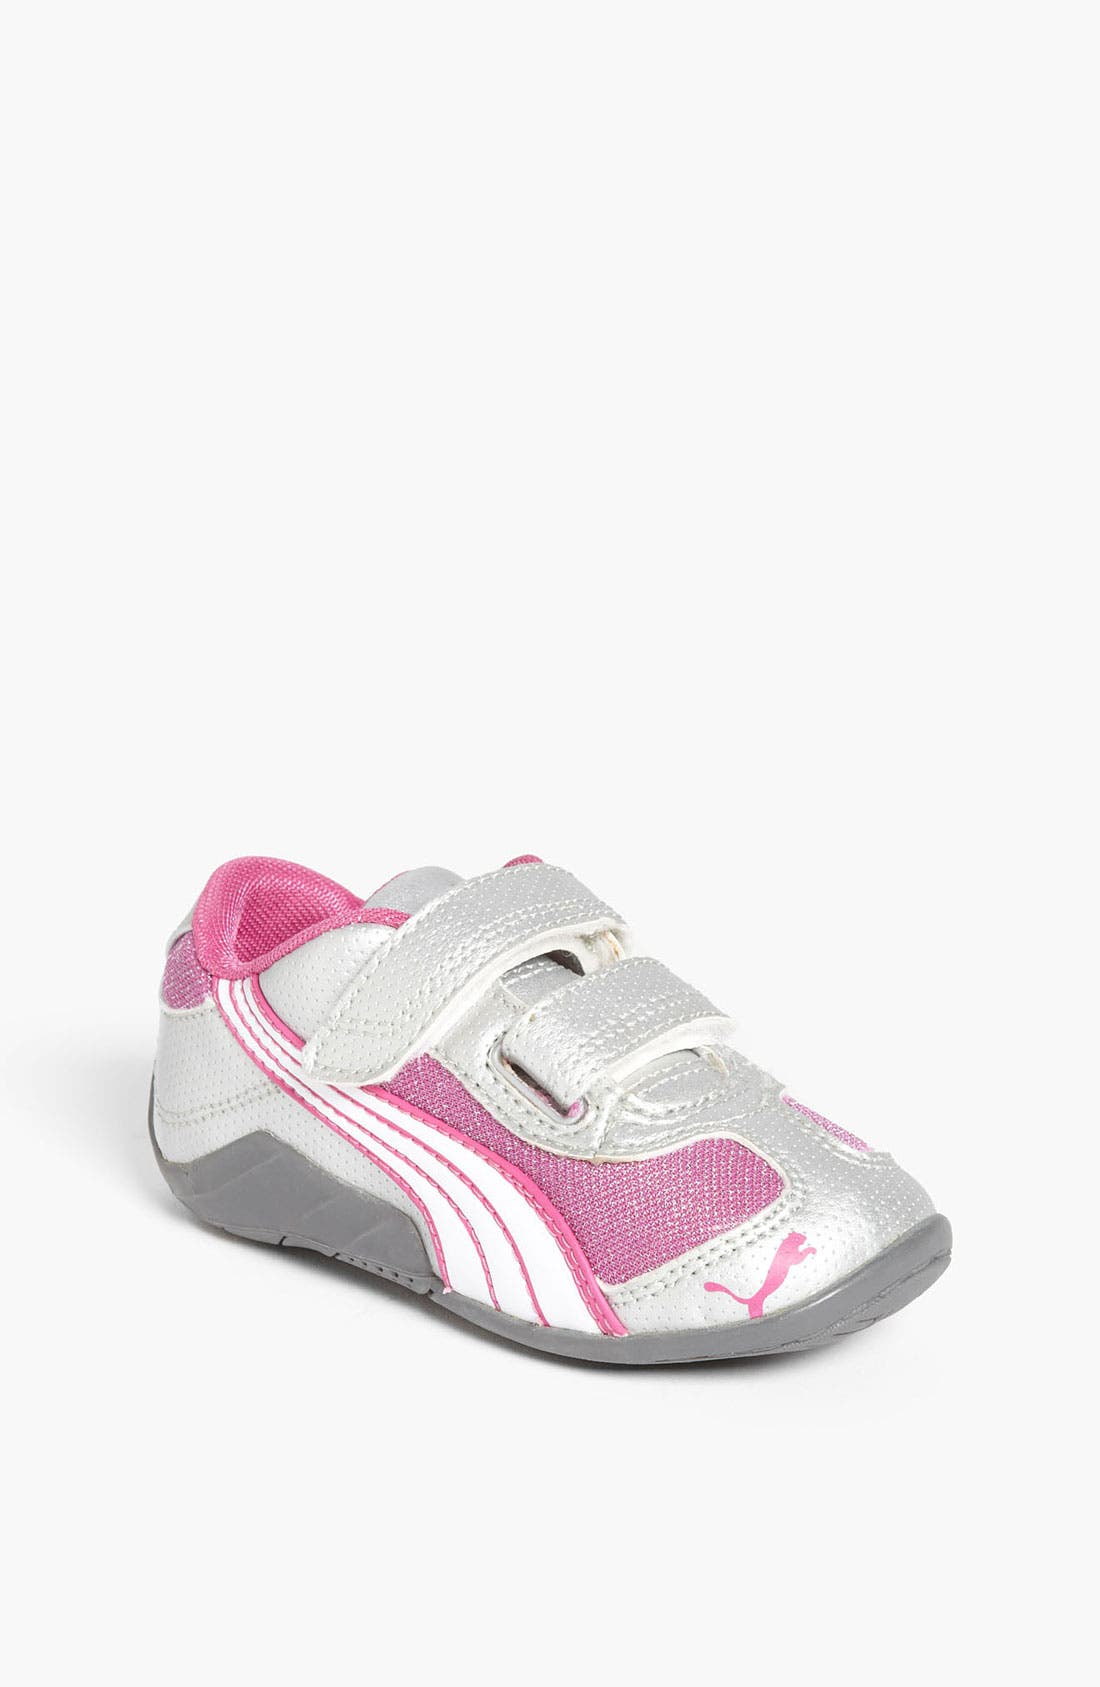 Main Image - PUMA 'Millennius Glitter' Sneaker (Baby, Walker & Toddler)